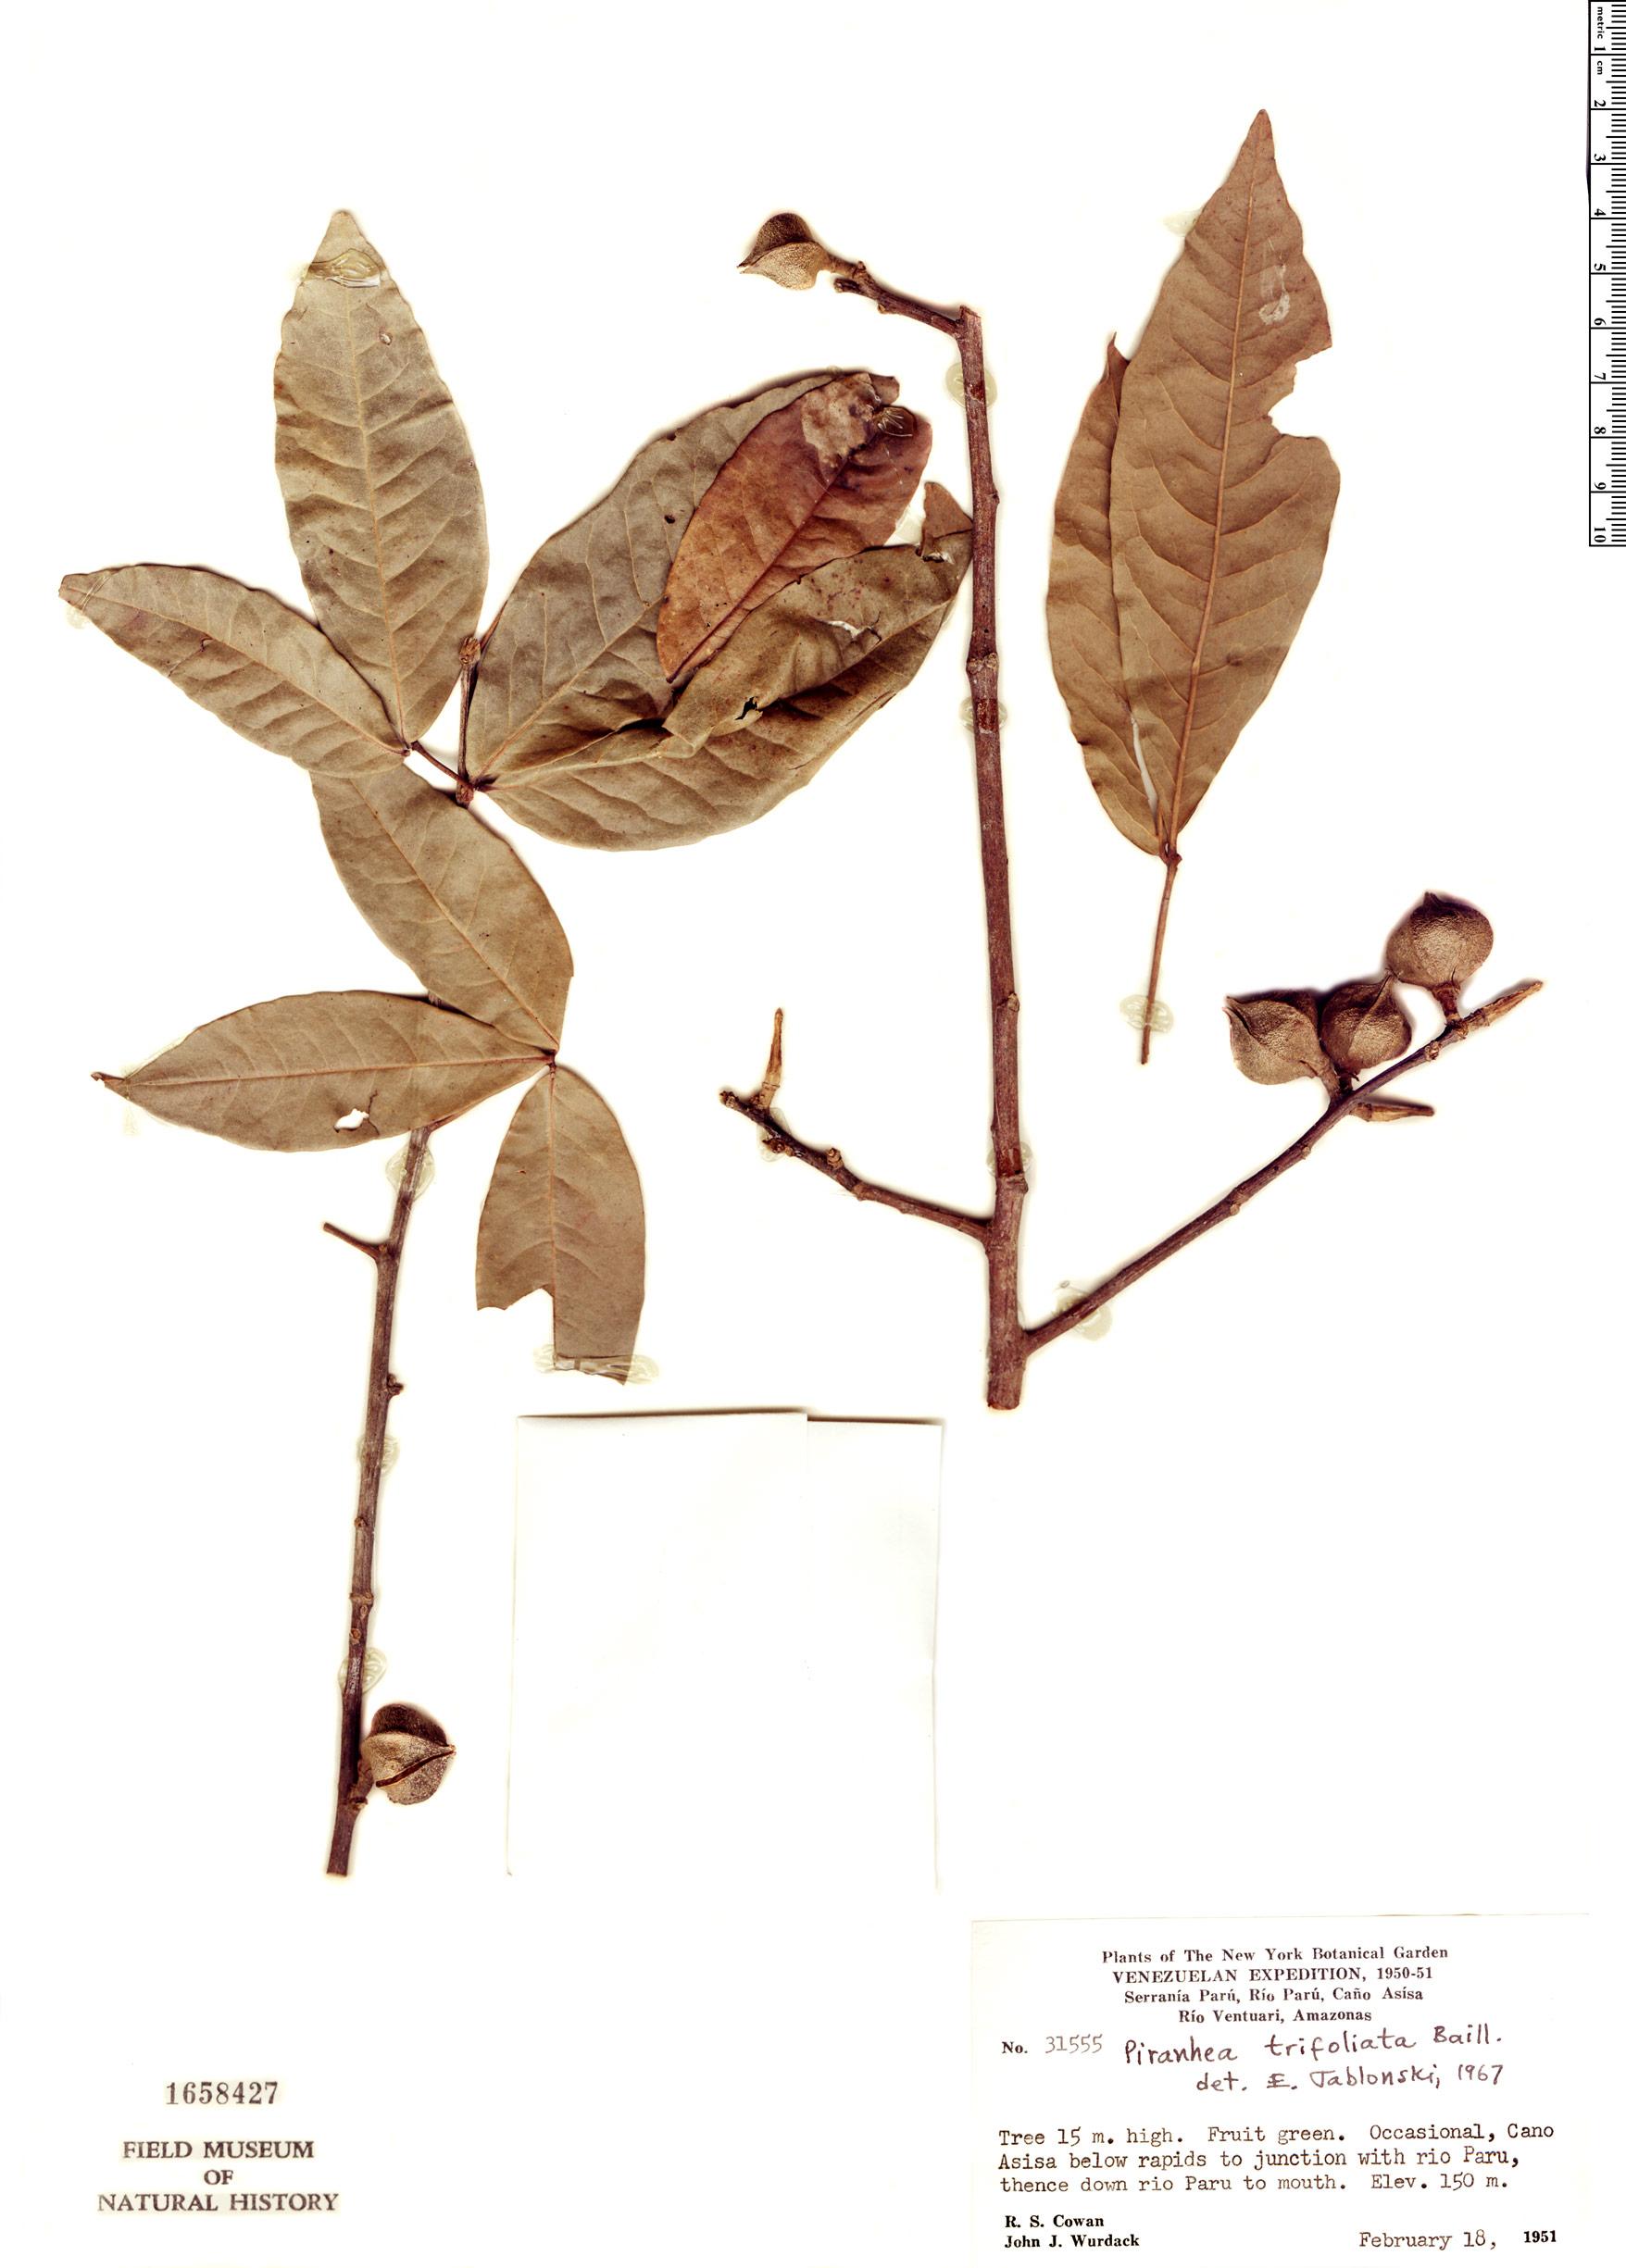 Specimen: Piranhea trifoliata